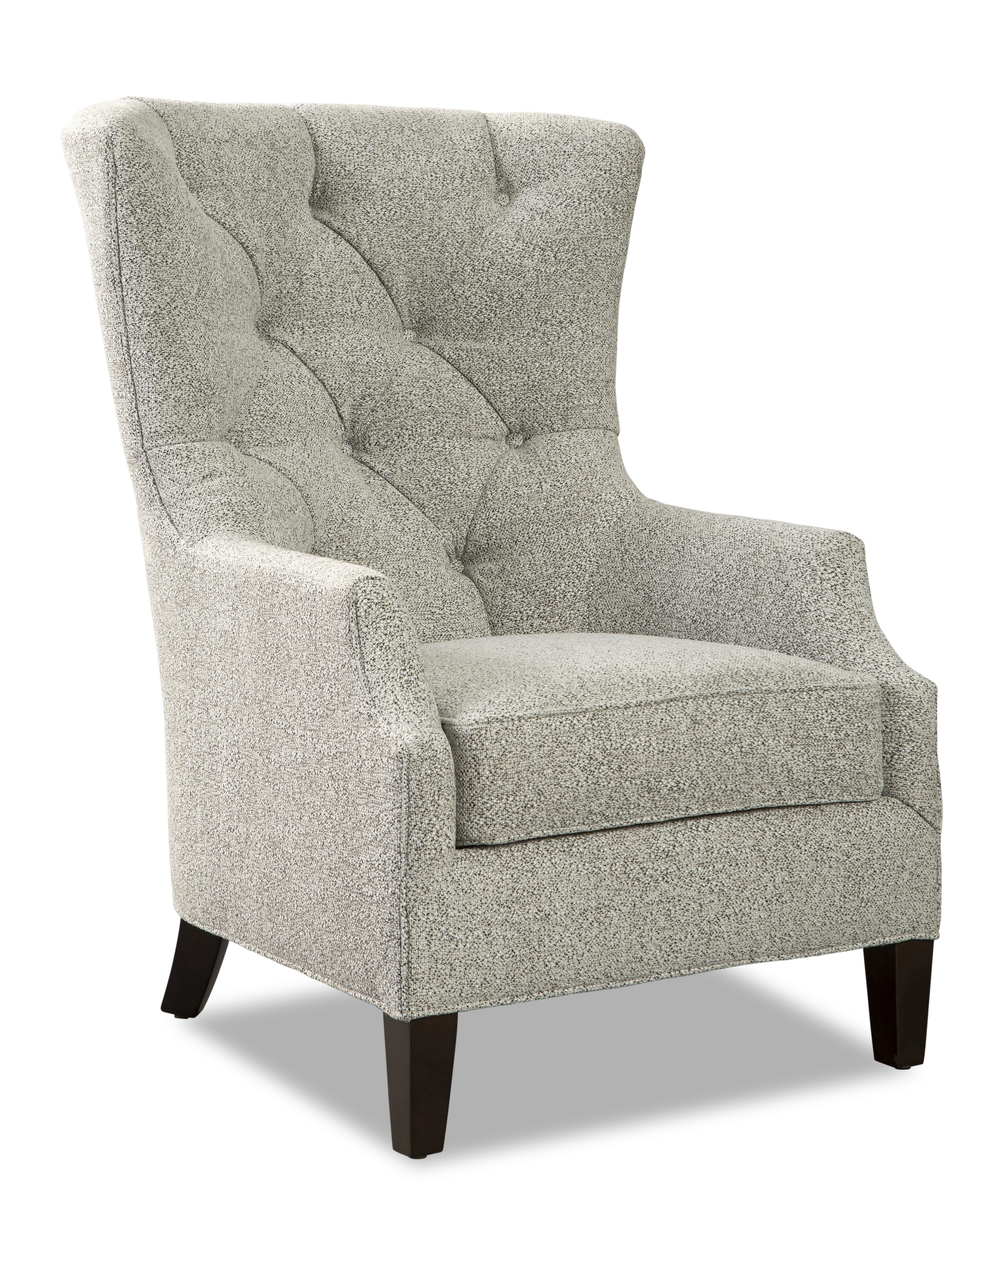 Huntington House - Cora Chair